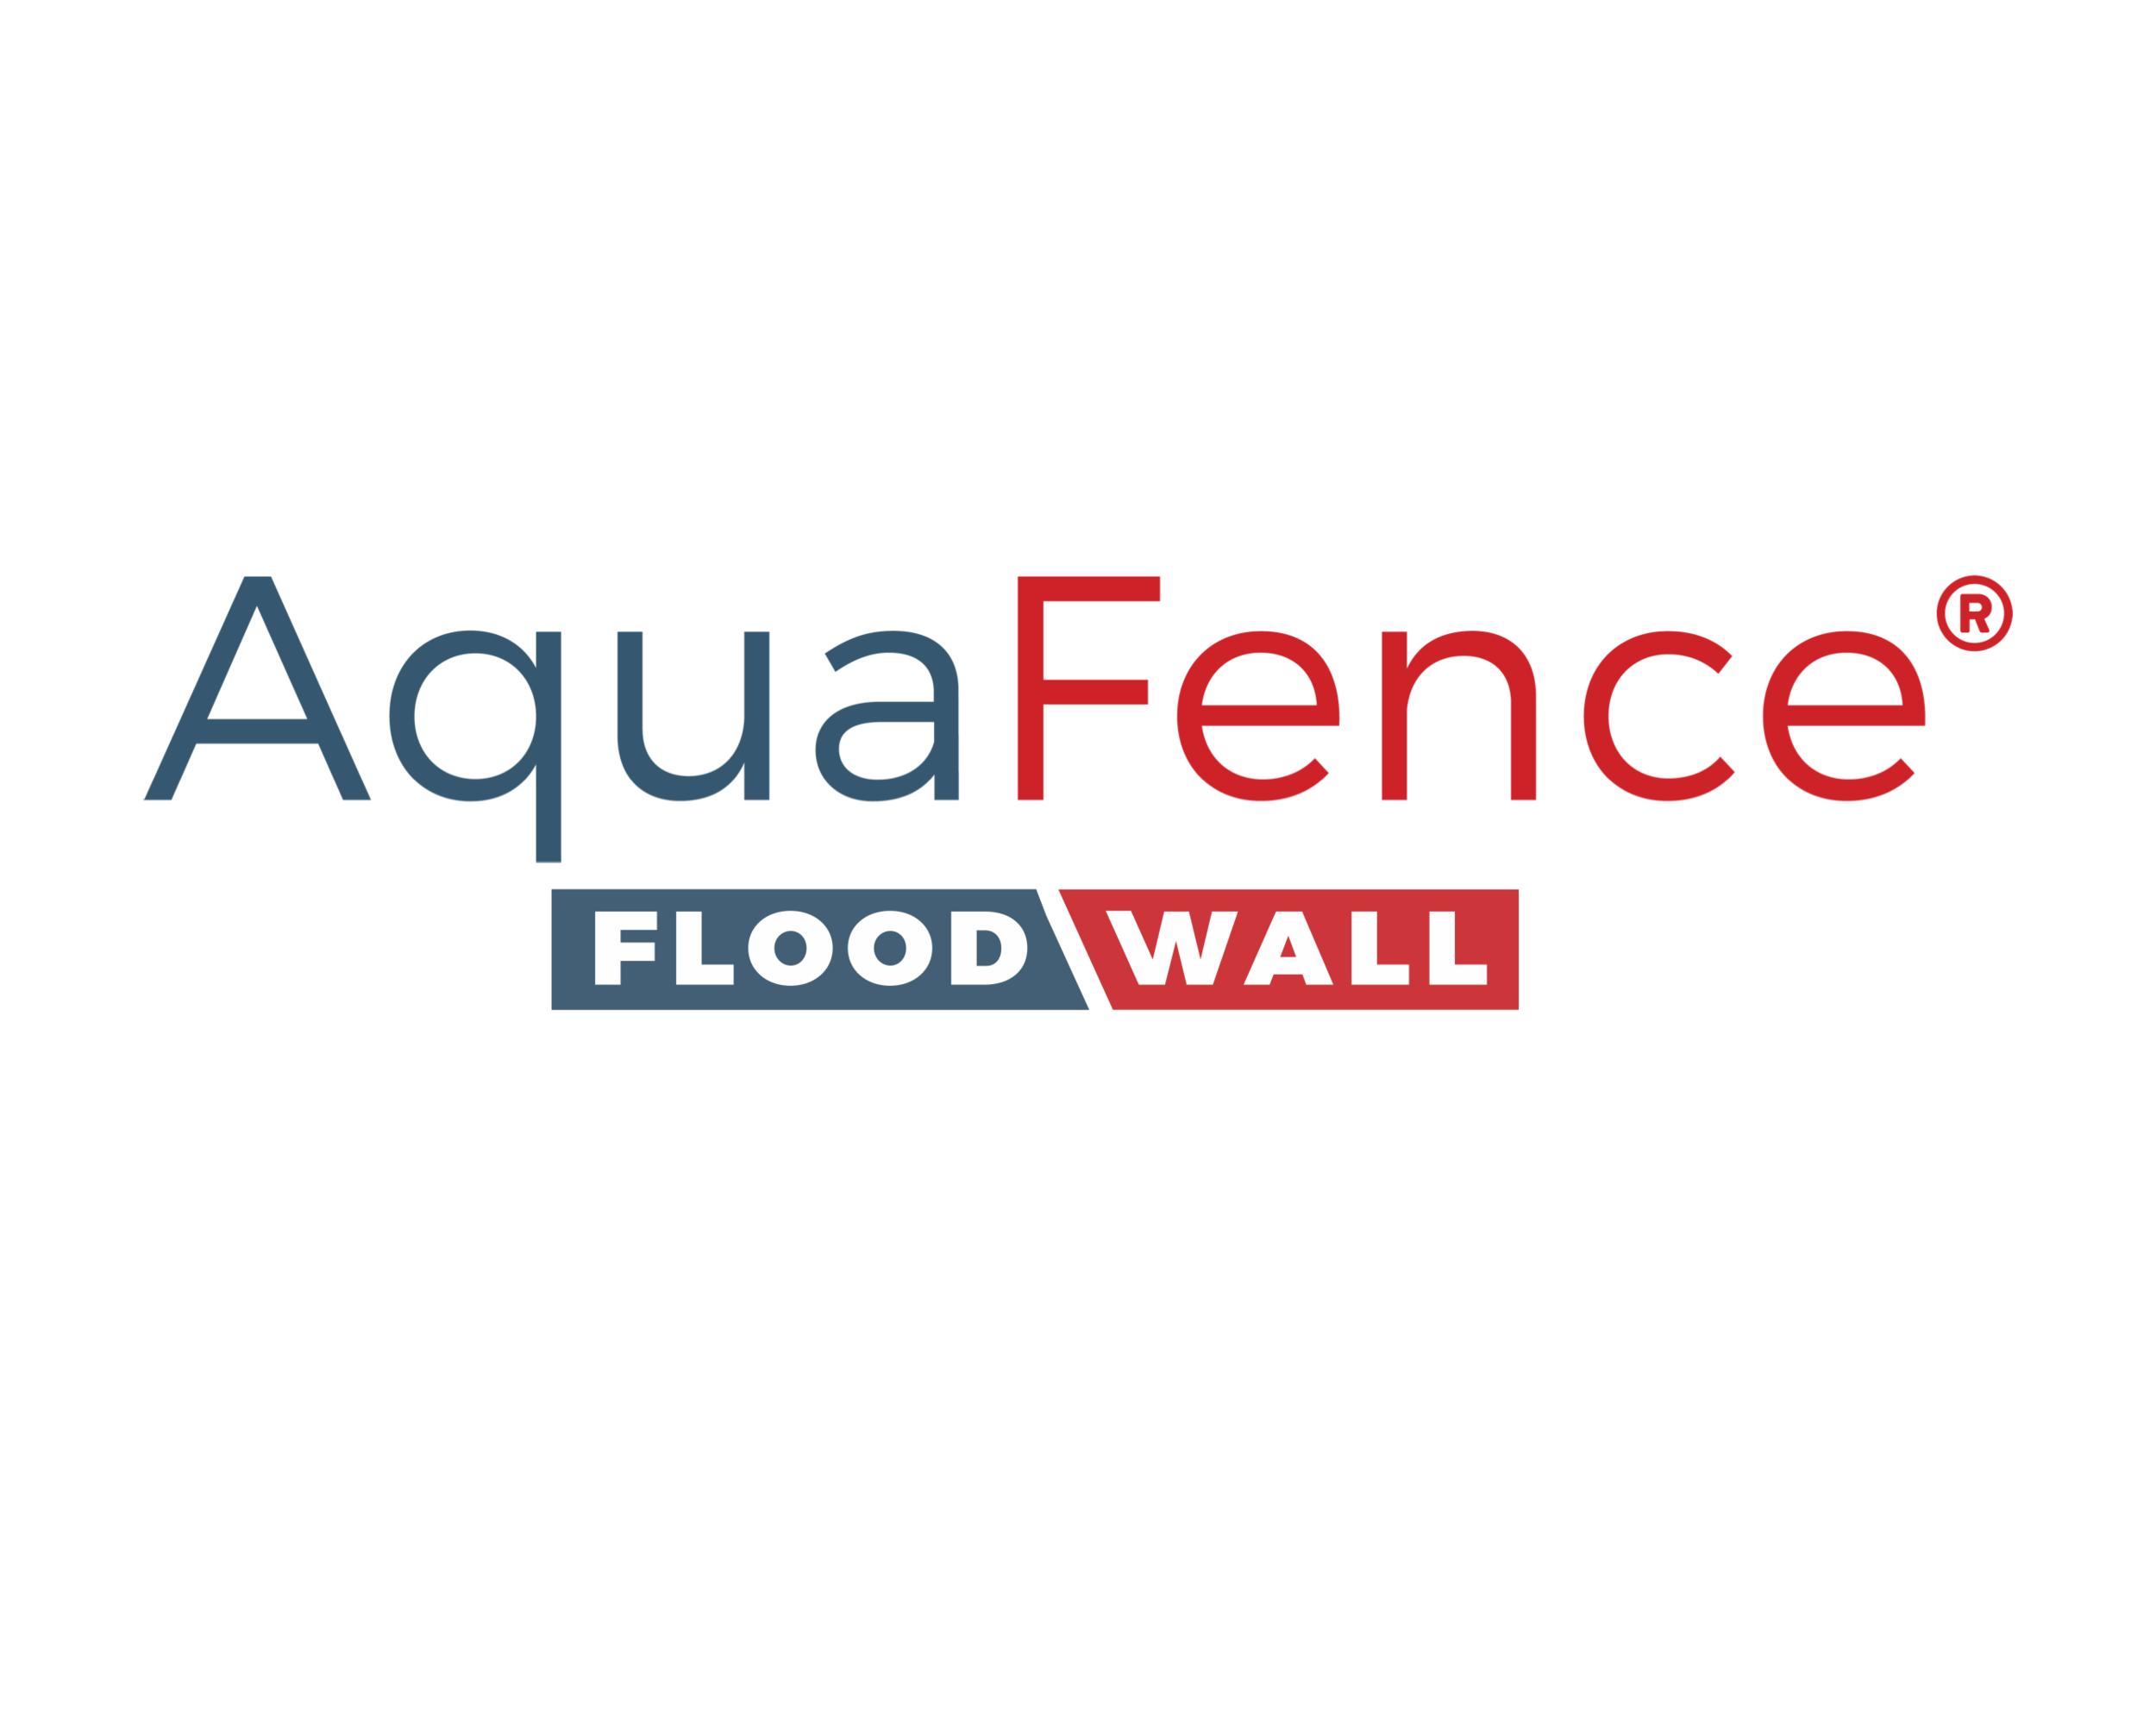 AquaFence FloodWall new2-kopi.png